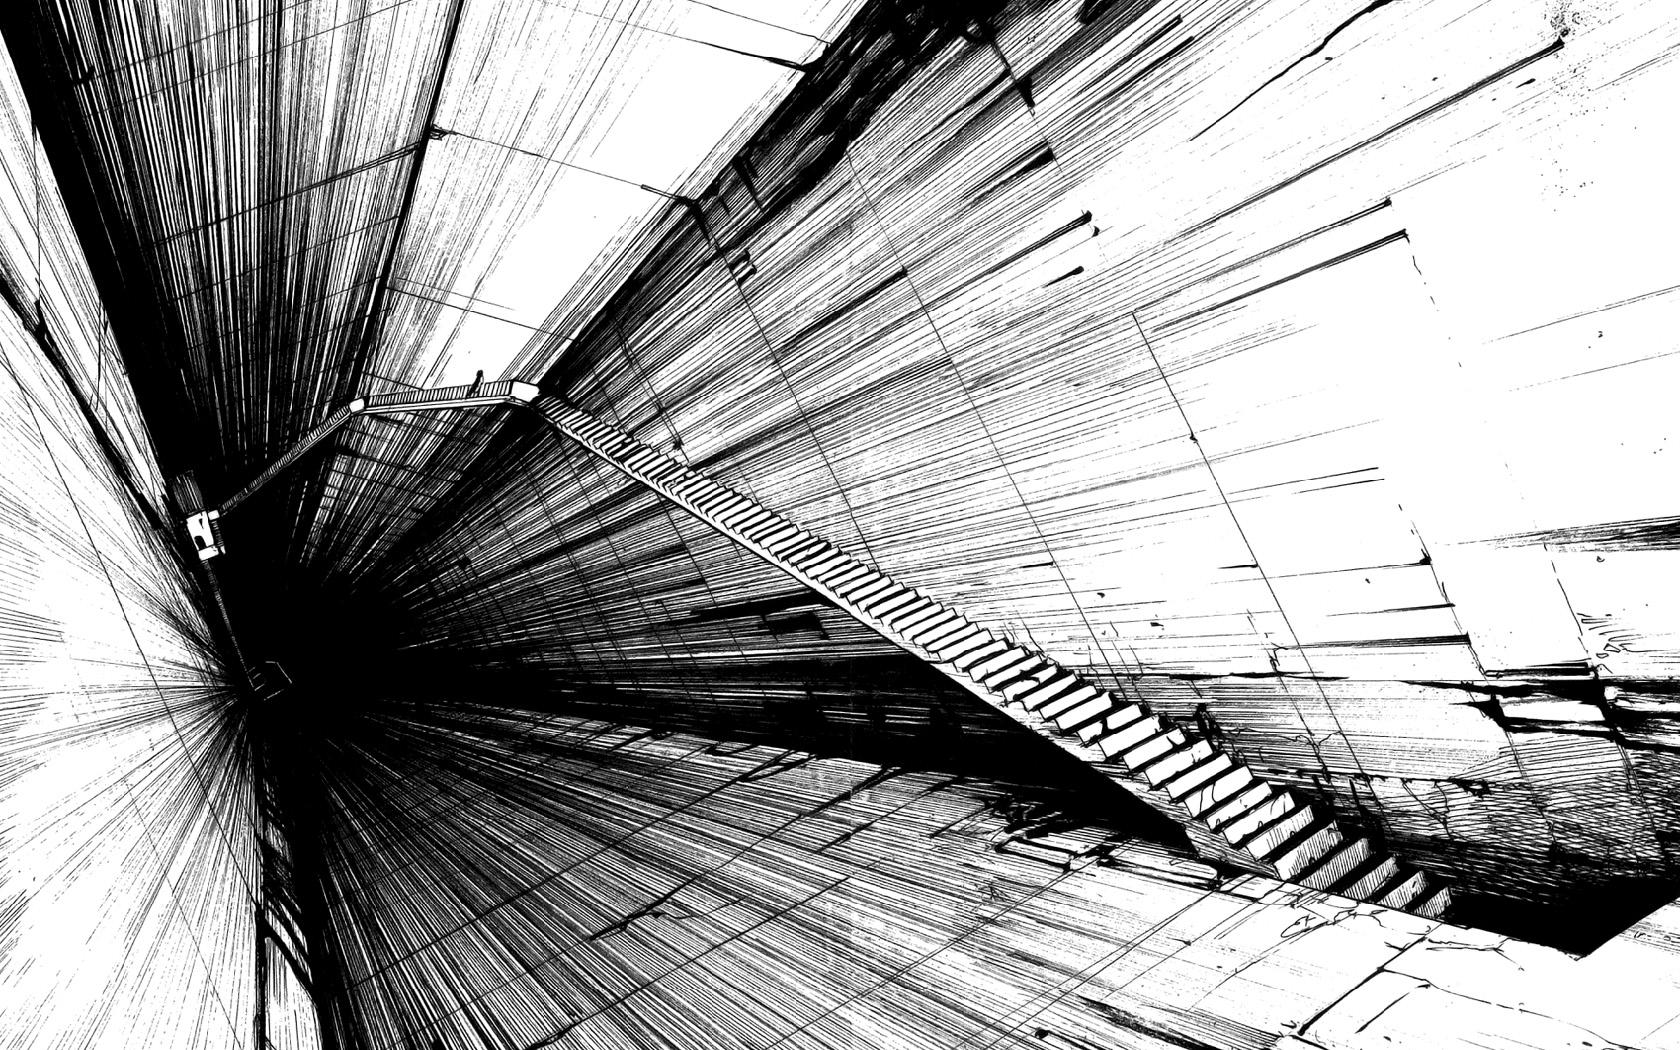 Black and White Abstract Wallpapers - WallpaperSafari